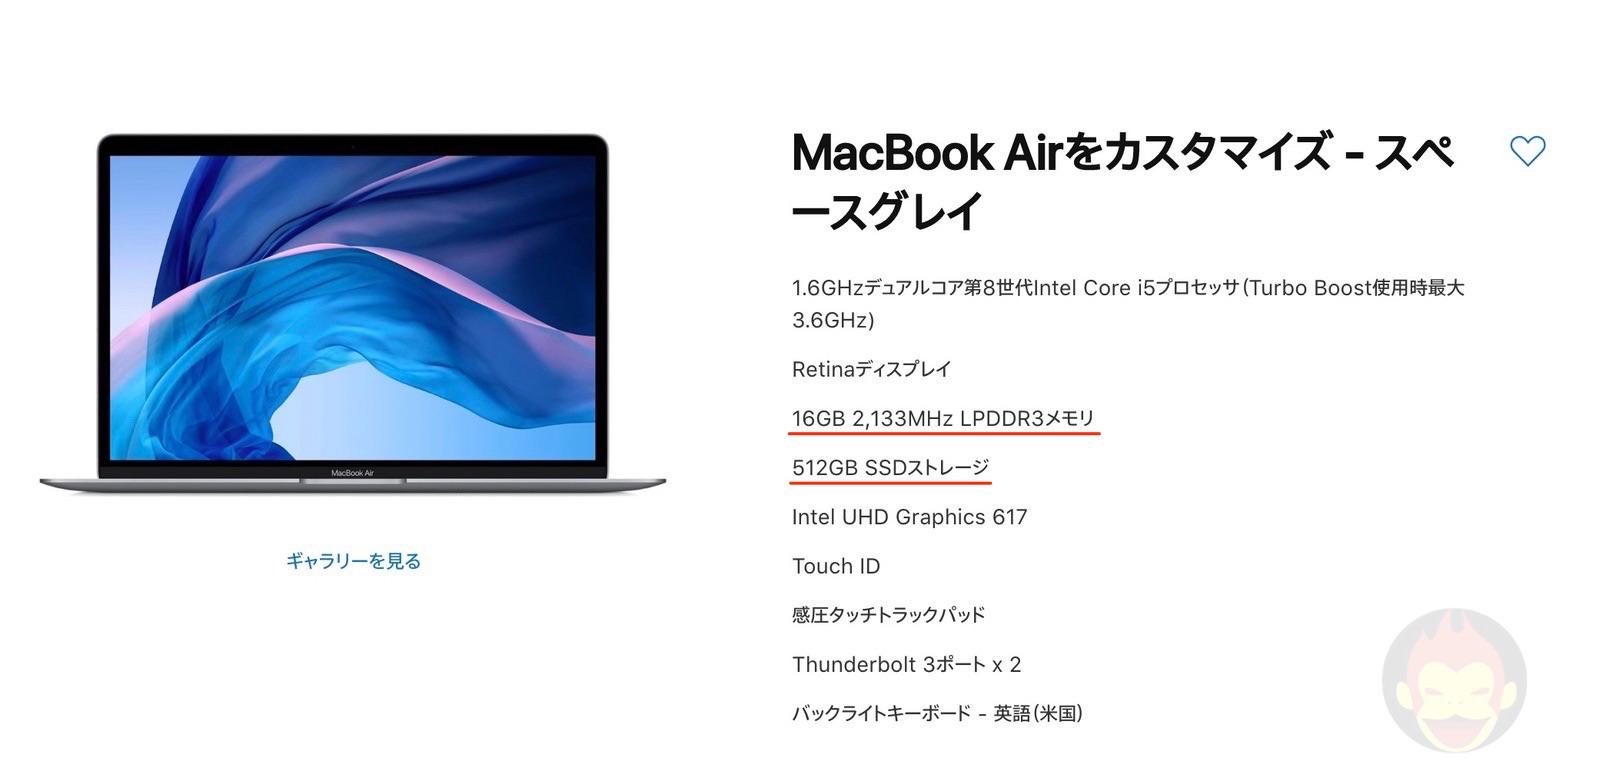 MacBook-Air-Customize-RAM-16GB-01-2.jpg